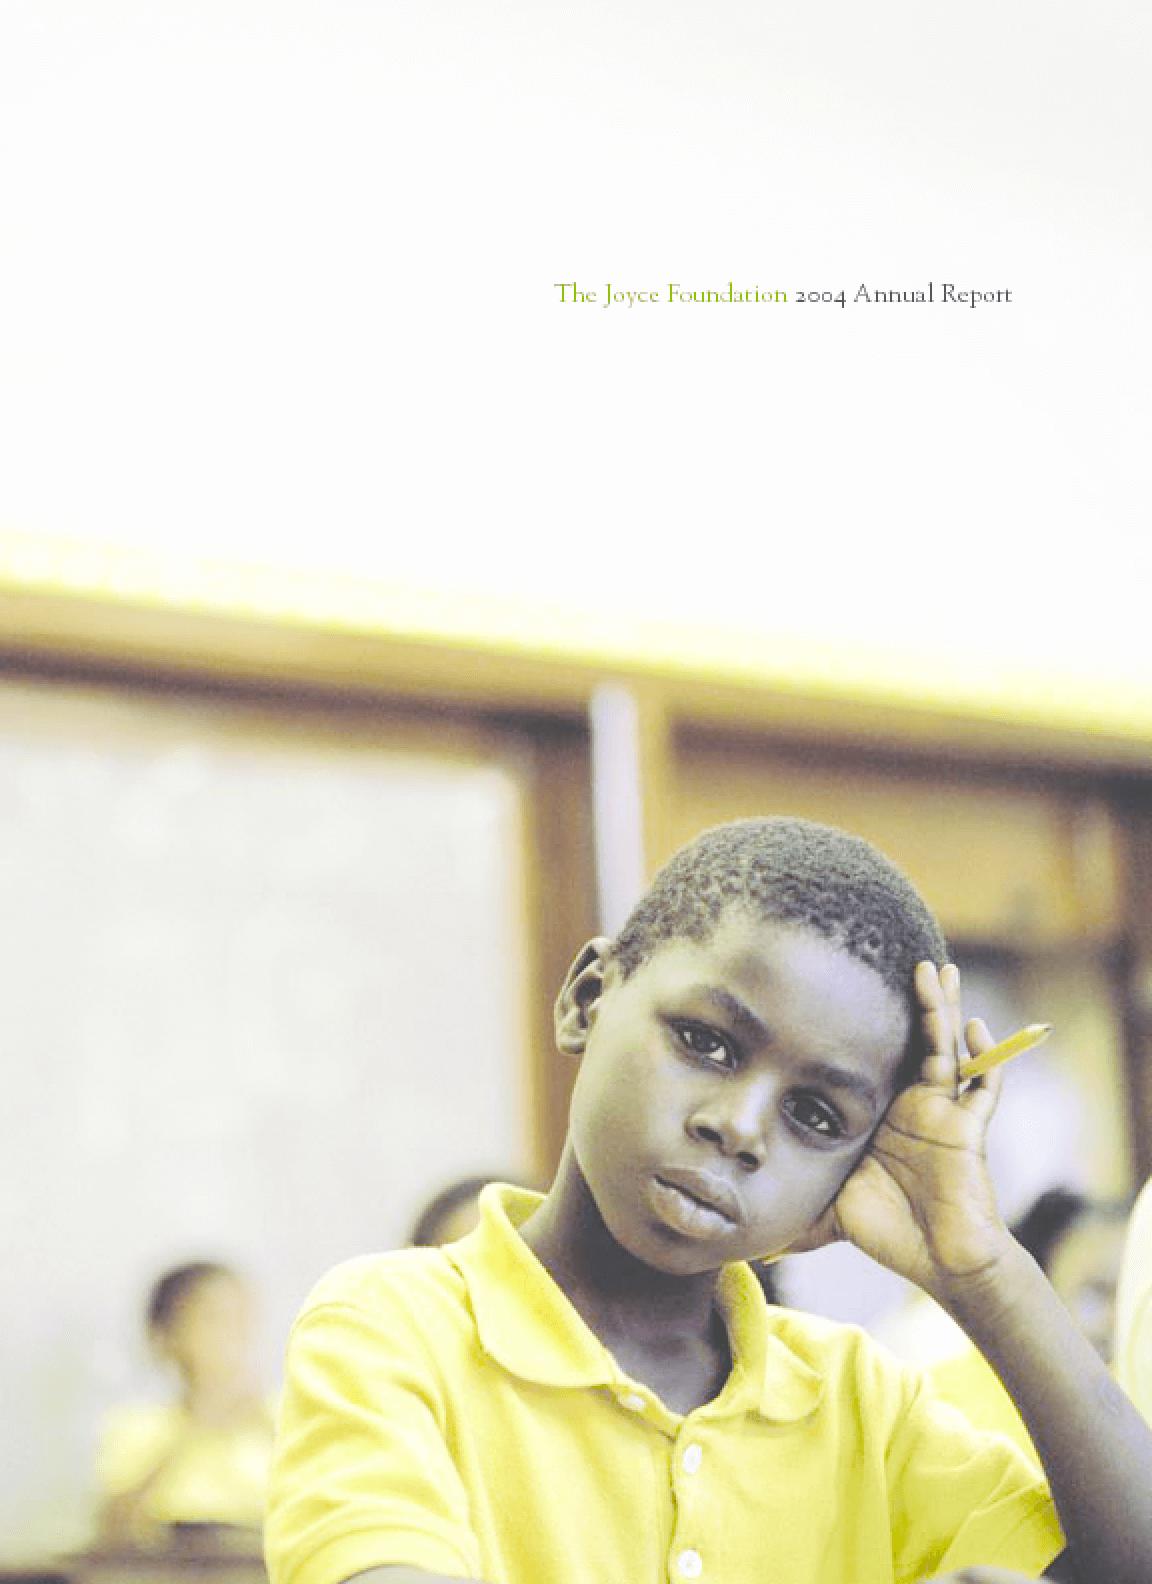 Joyce Foundation - 2004 Annual Report